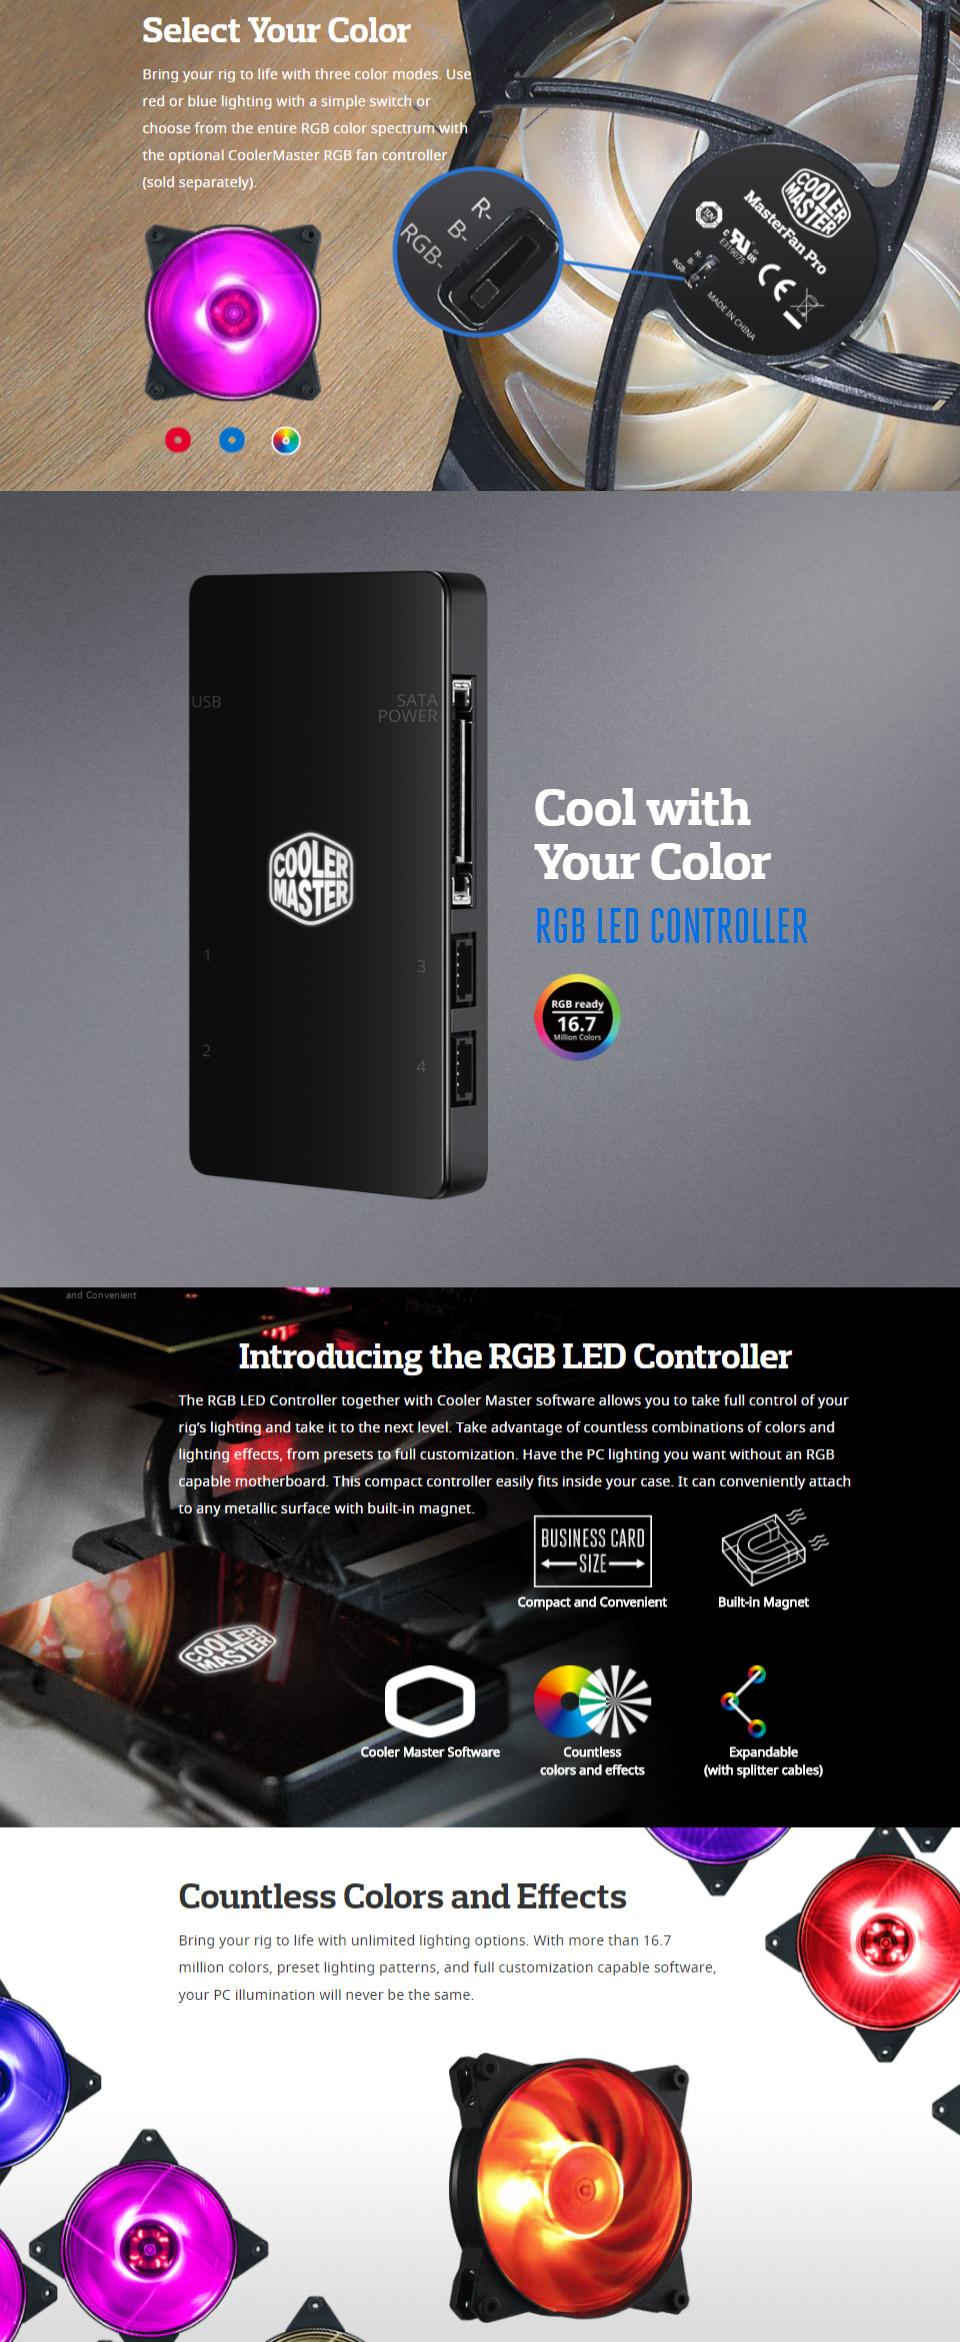 Cooler Master Rgb Software